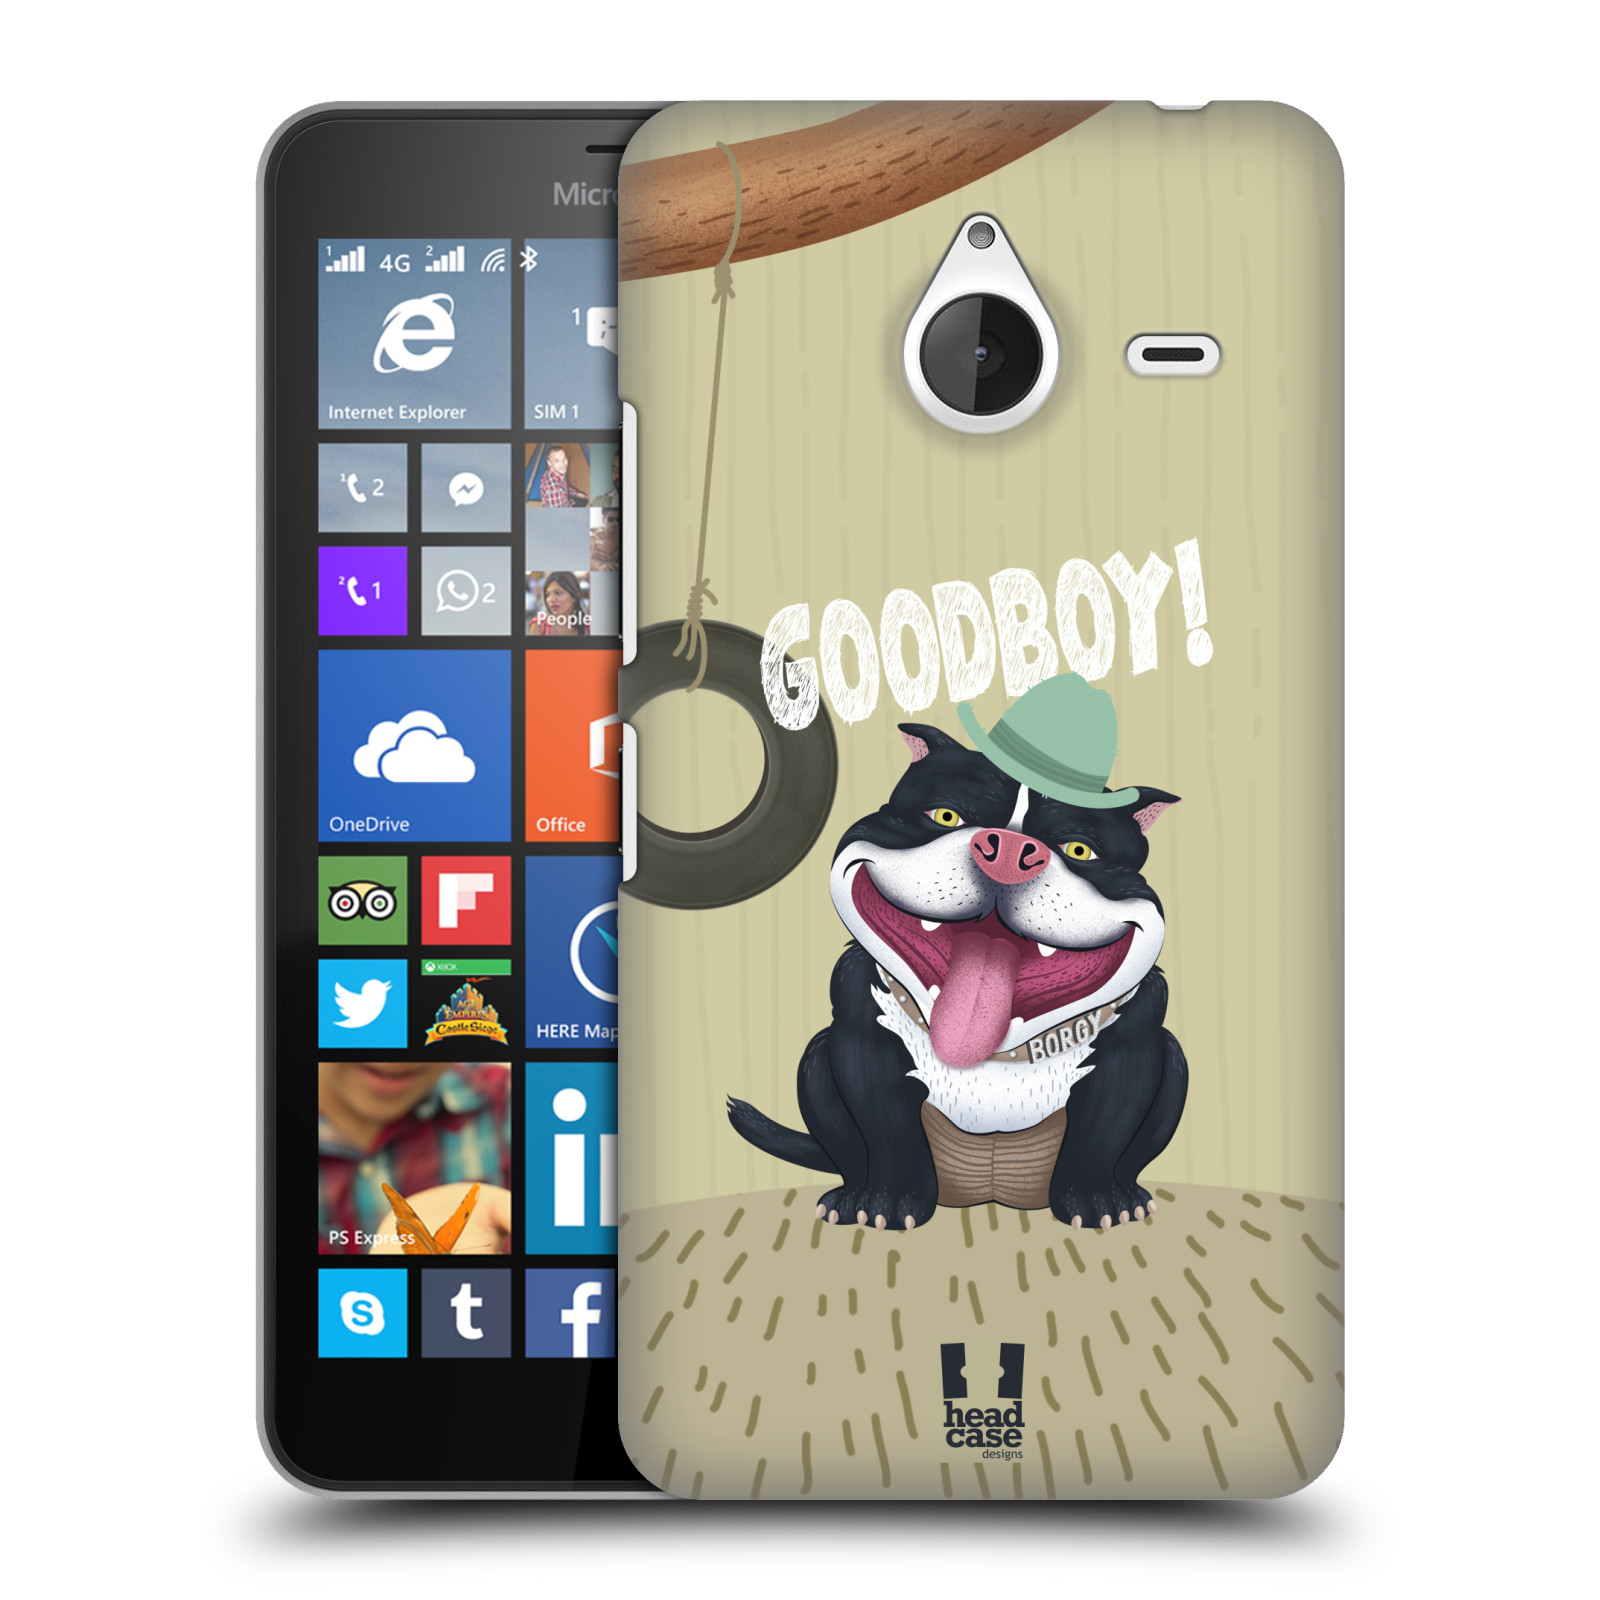 Plastové pouzdro na mobil Microsoft Lumia 640 XL HEAD CASE Goodboy! Pejsek (Kryt či obal na mobilní telefon Microsoft Lumia 640 XL)